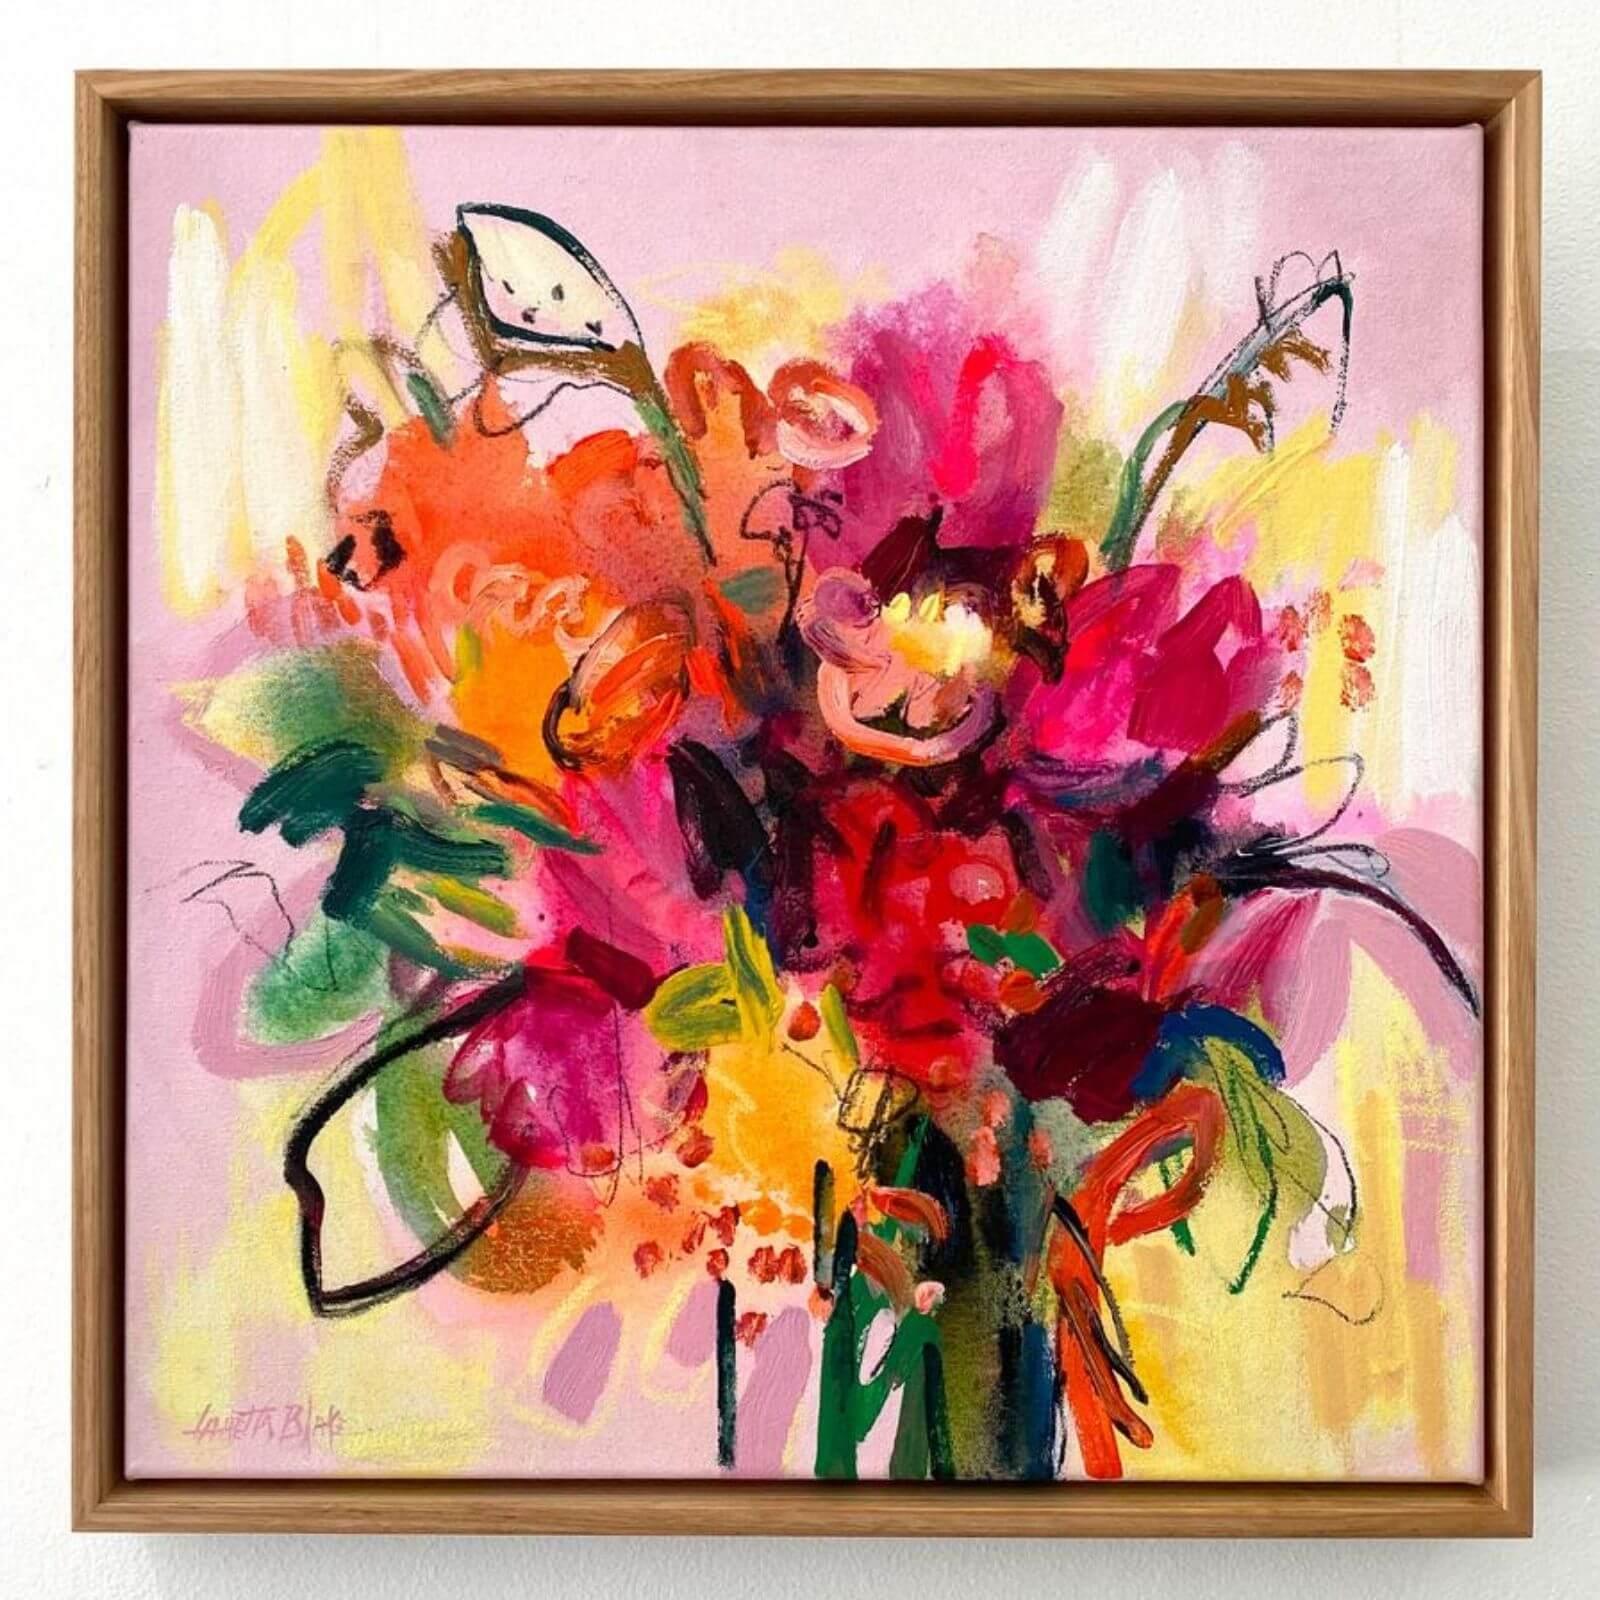 Artwork Loretta Blake